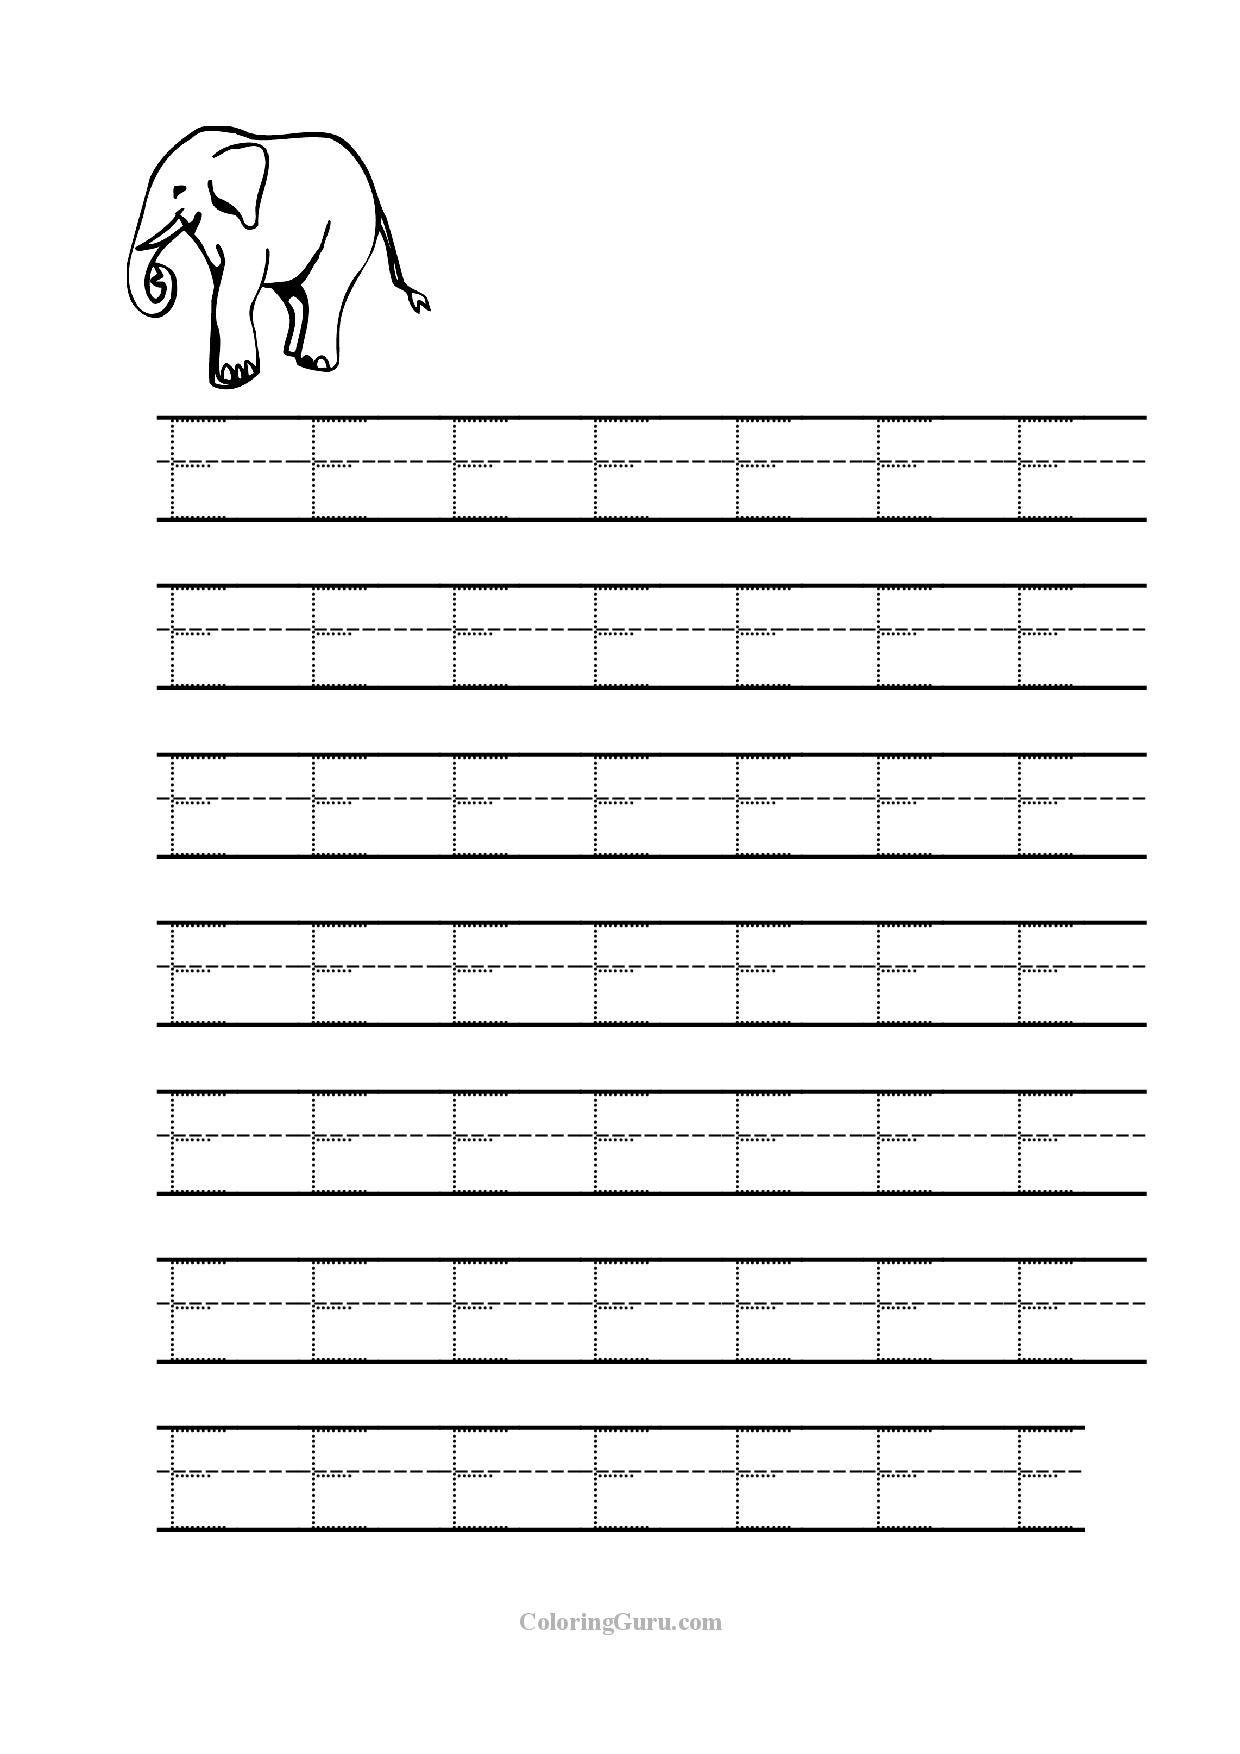 Tracing Letter D Worksheets For Preschool | Printables regarding Tracing Letter E Worksheets